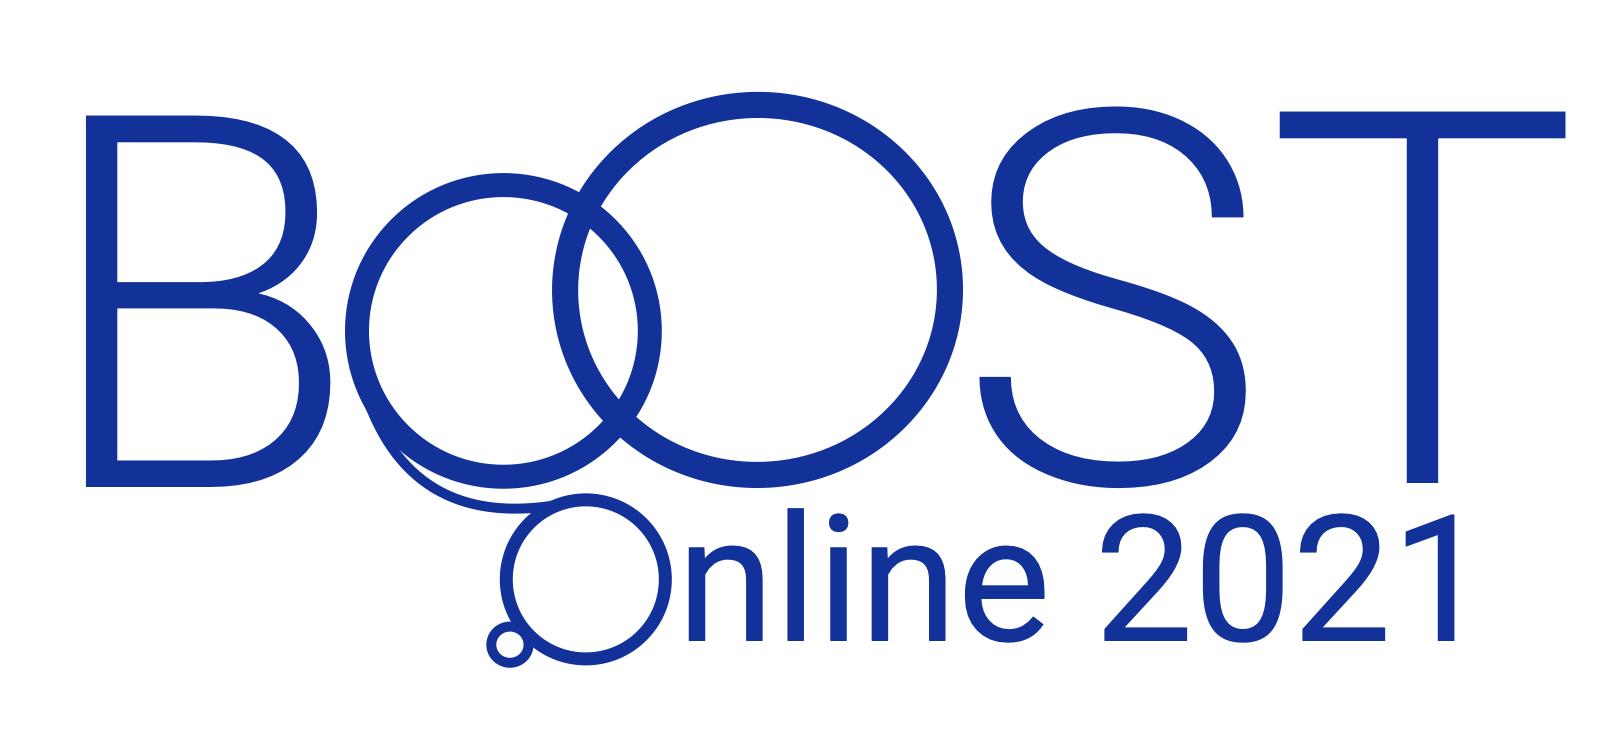 BOOST 2021 logo